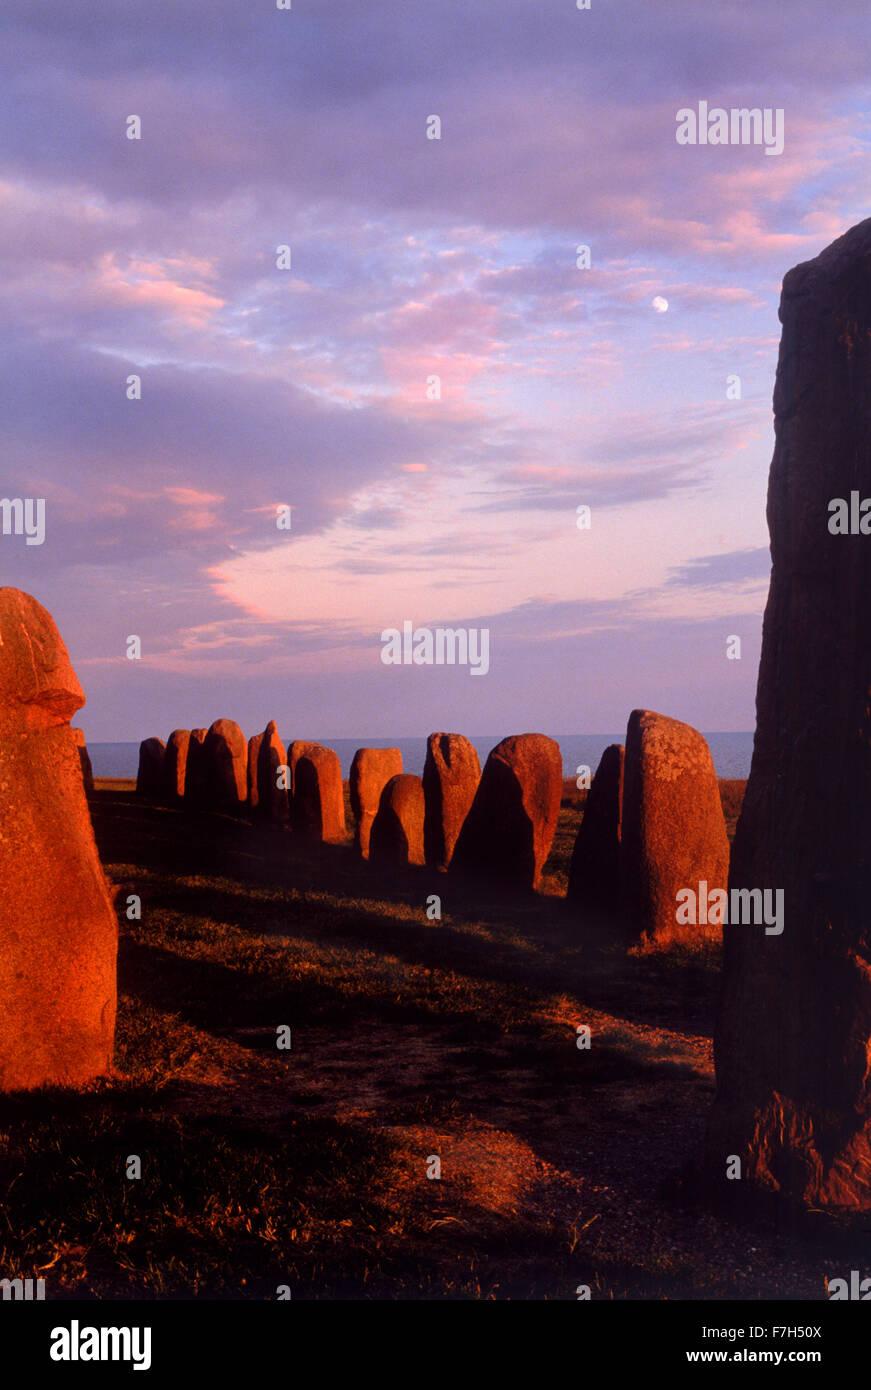 Ales stenar at Österlen under sunset skies.  Megalithic monument in Skåne in southern Sweden. Viking ship - Stock Image